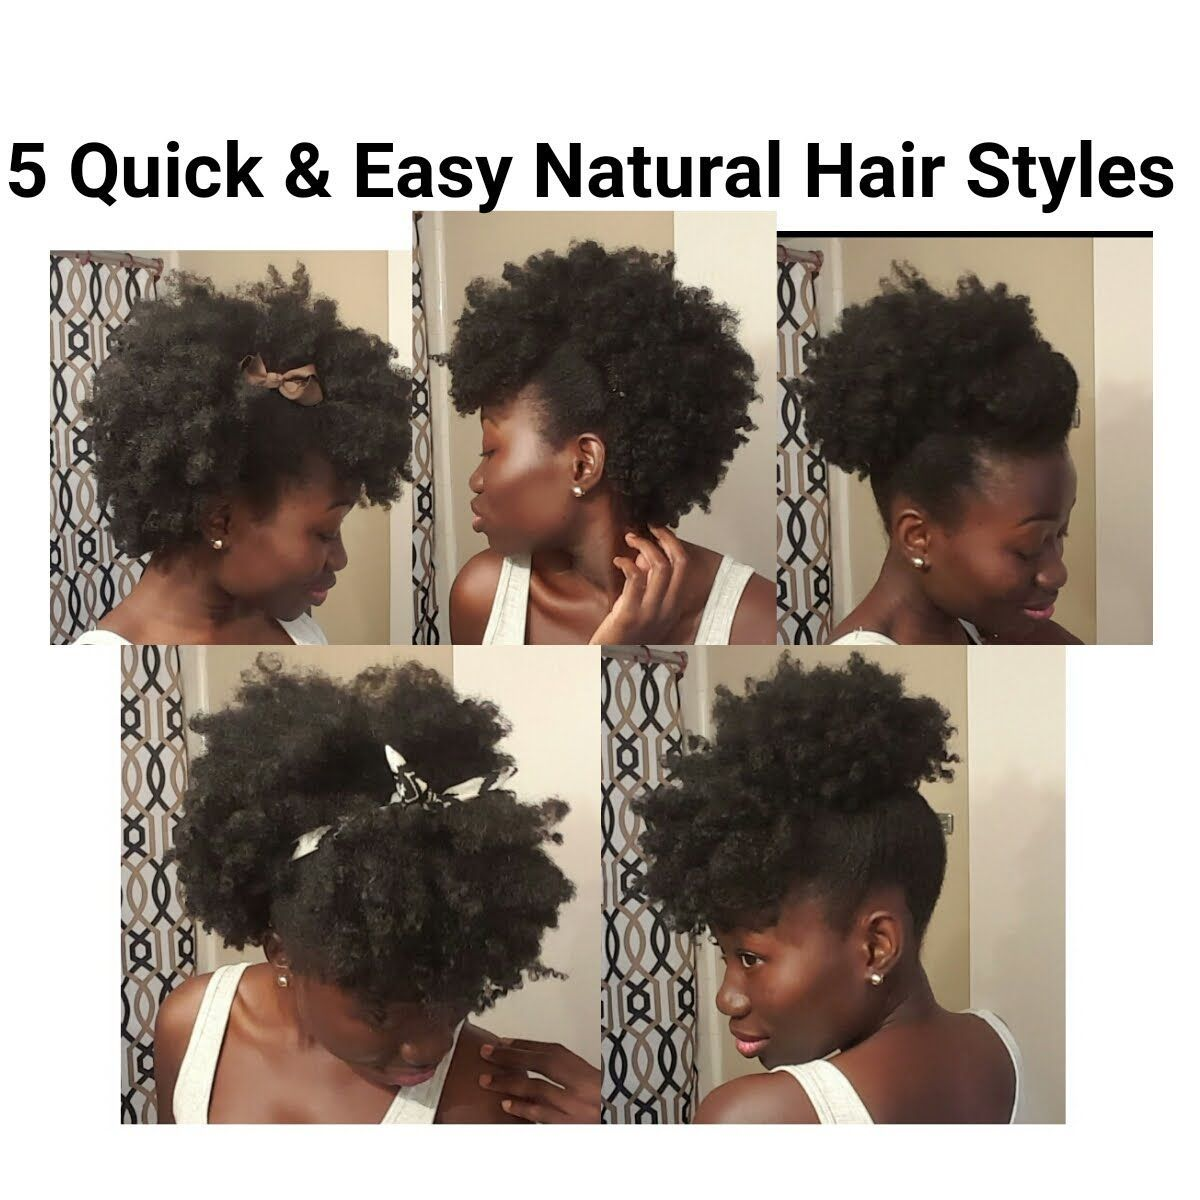 quick u easy natural hair styles shortmedium length